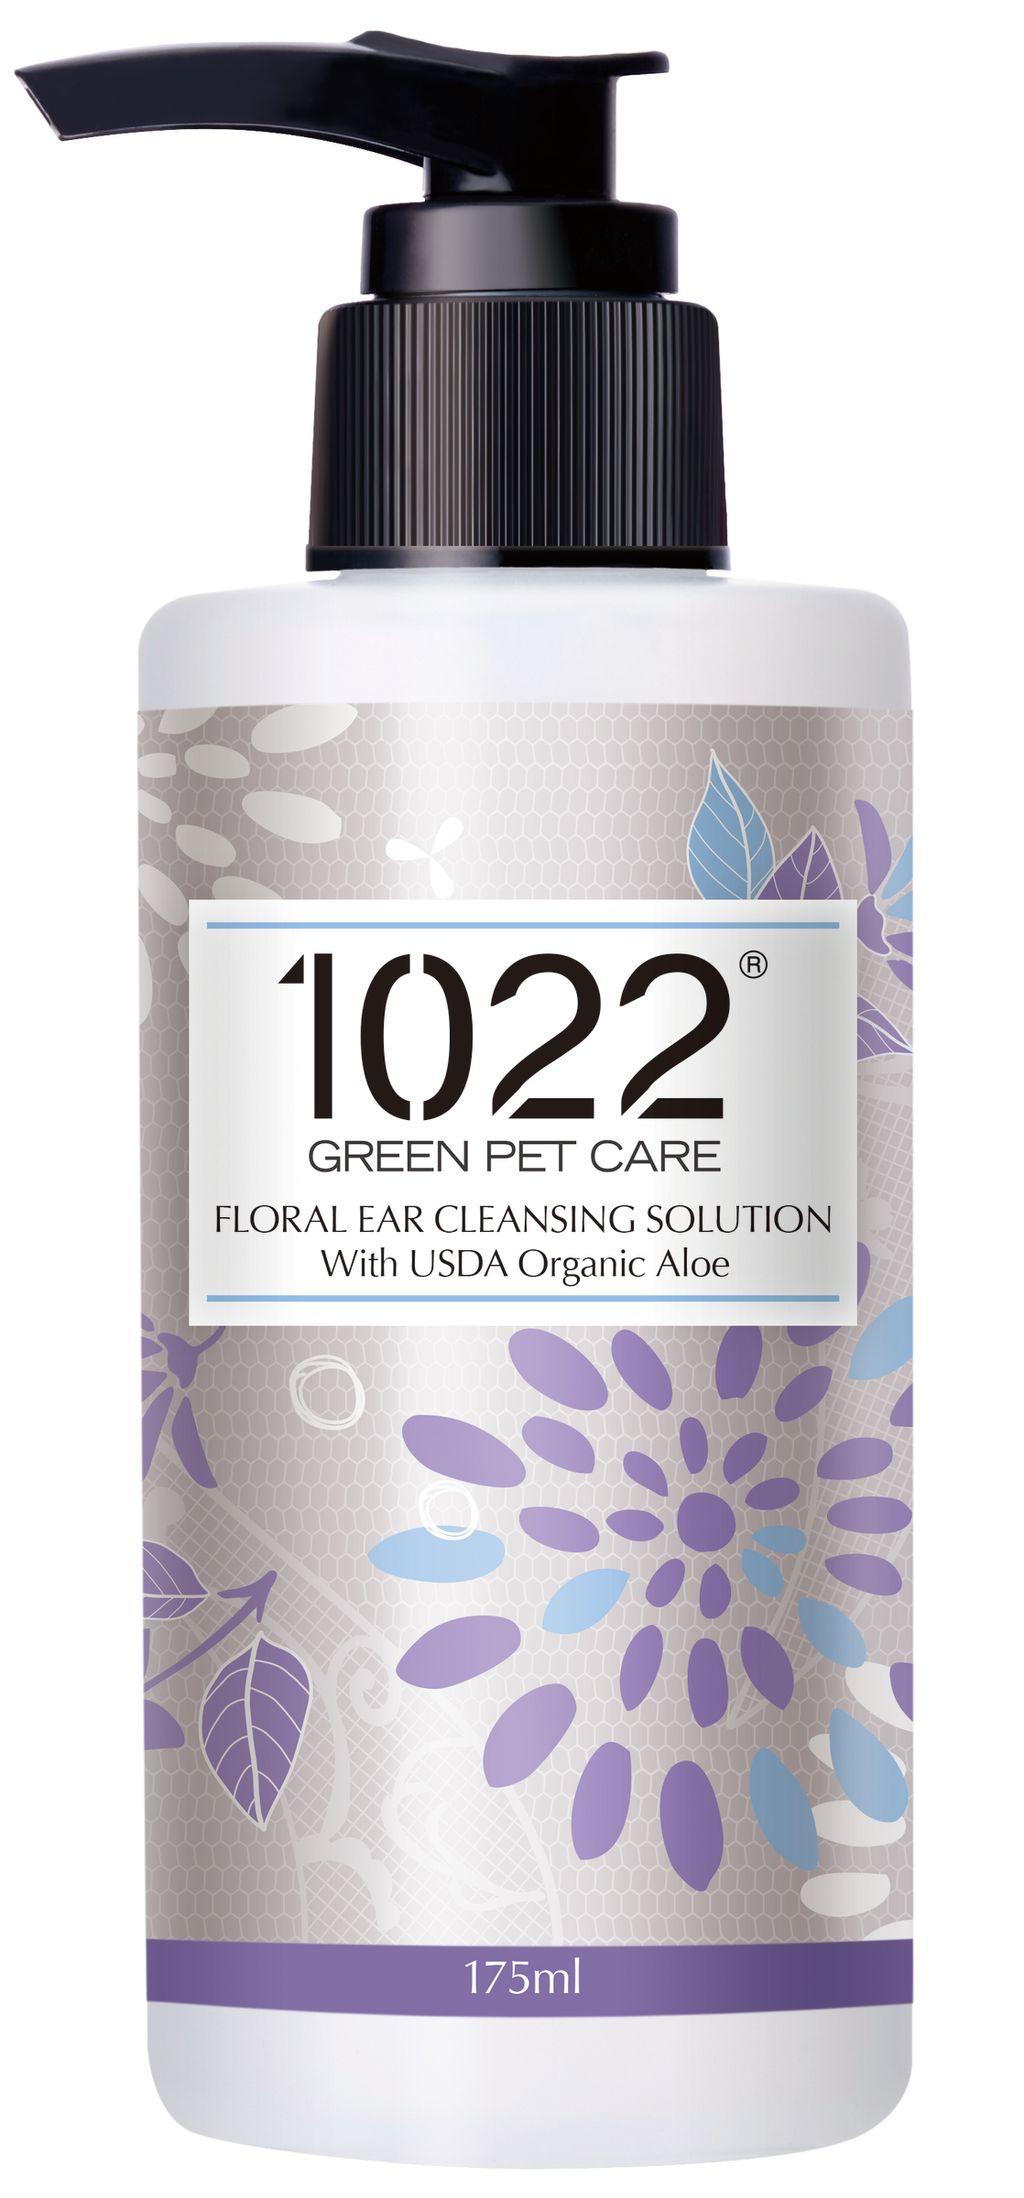 AP32 - 1022 Floral Ear Cleansing Solution 175ml.jpg